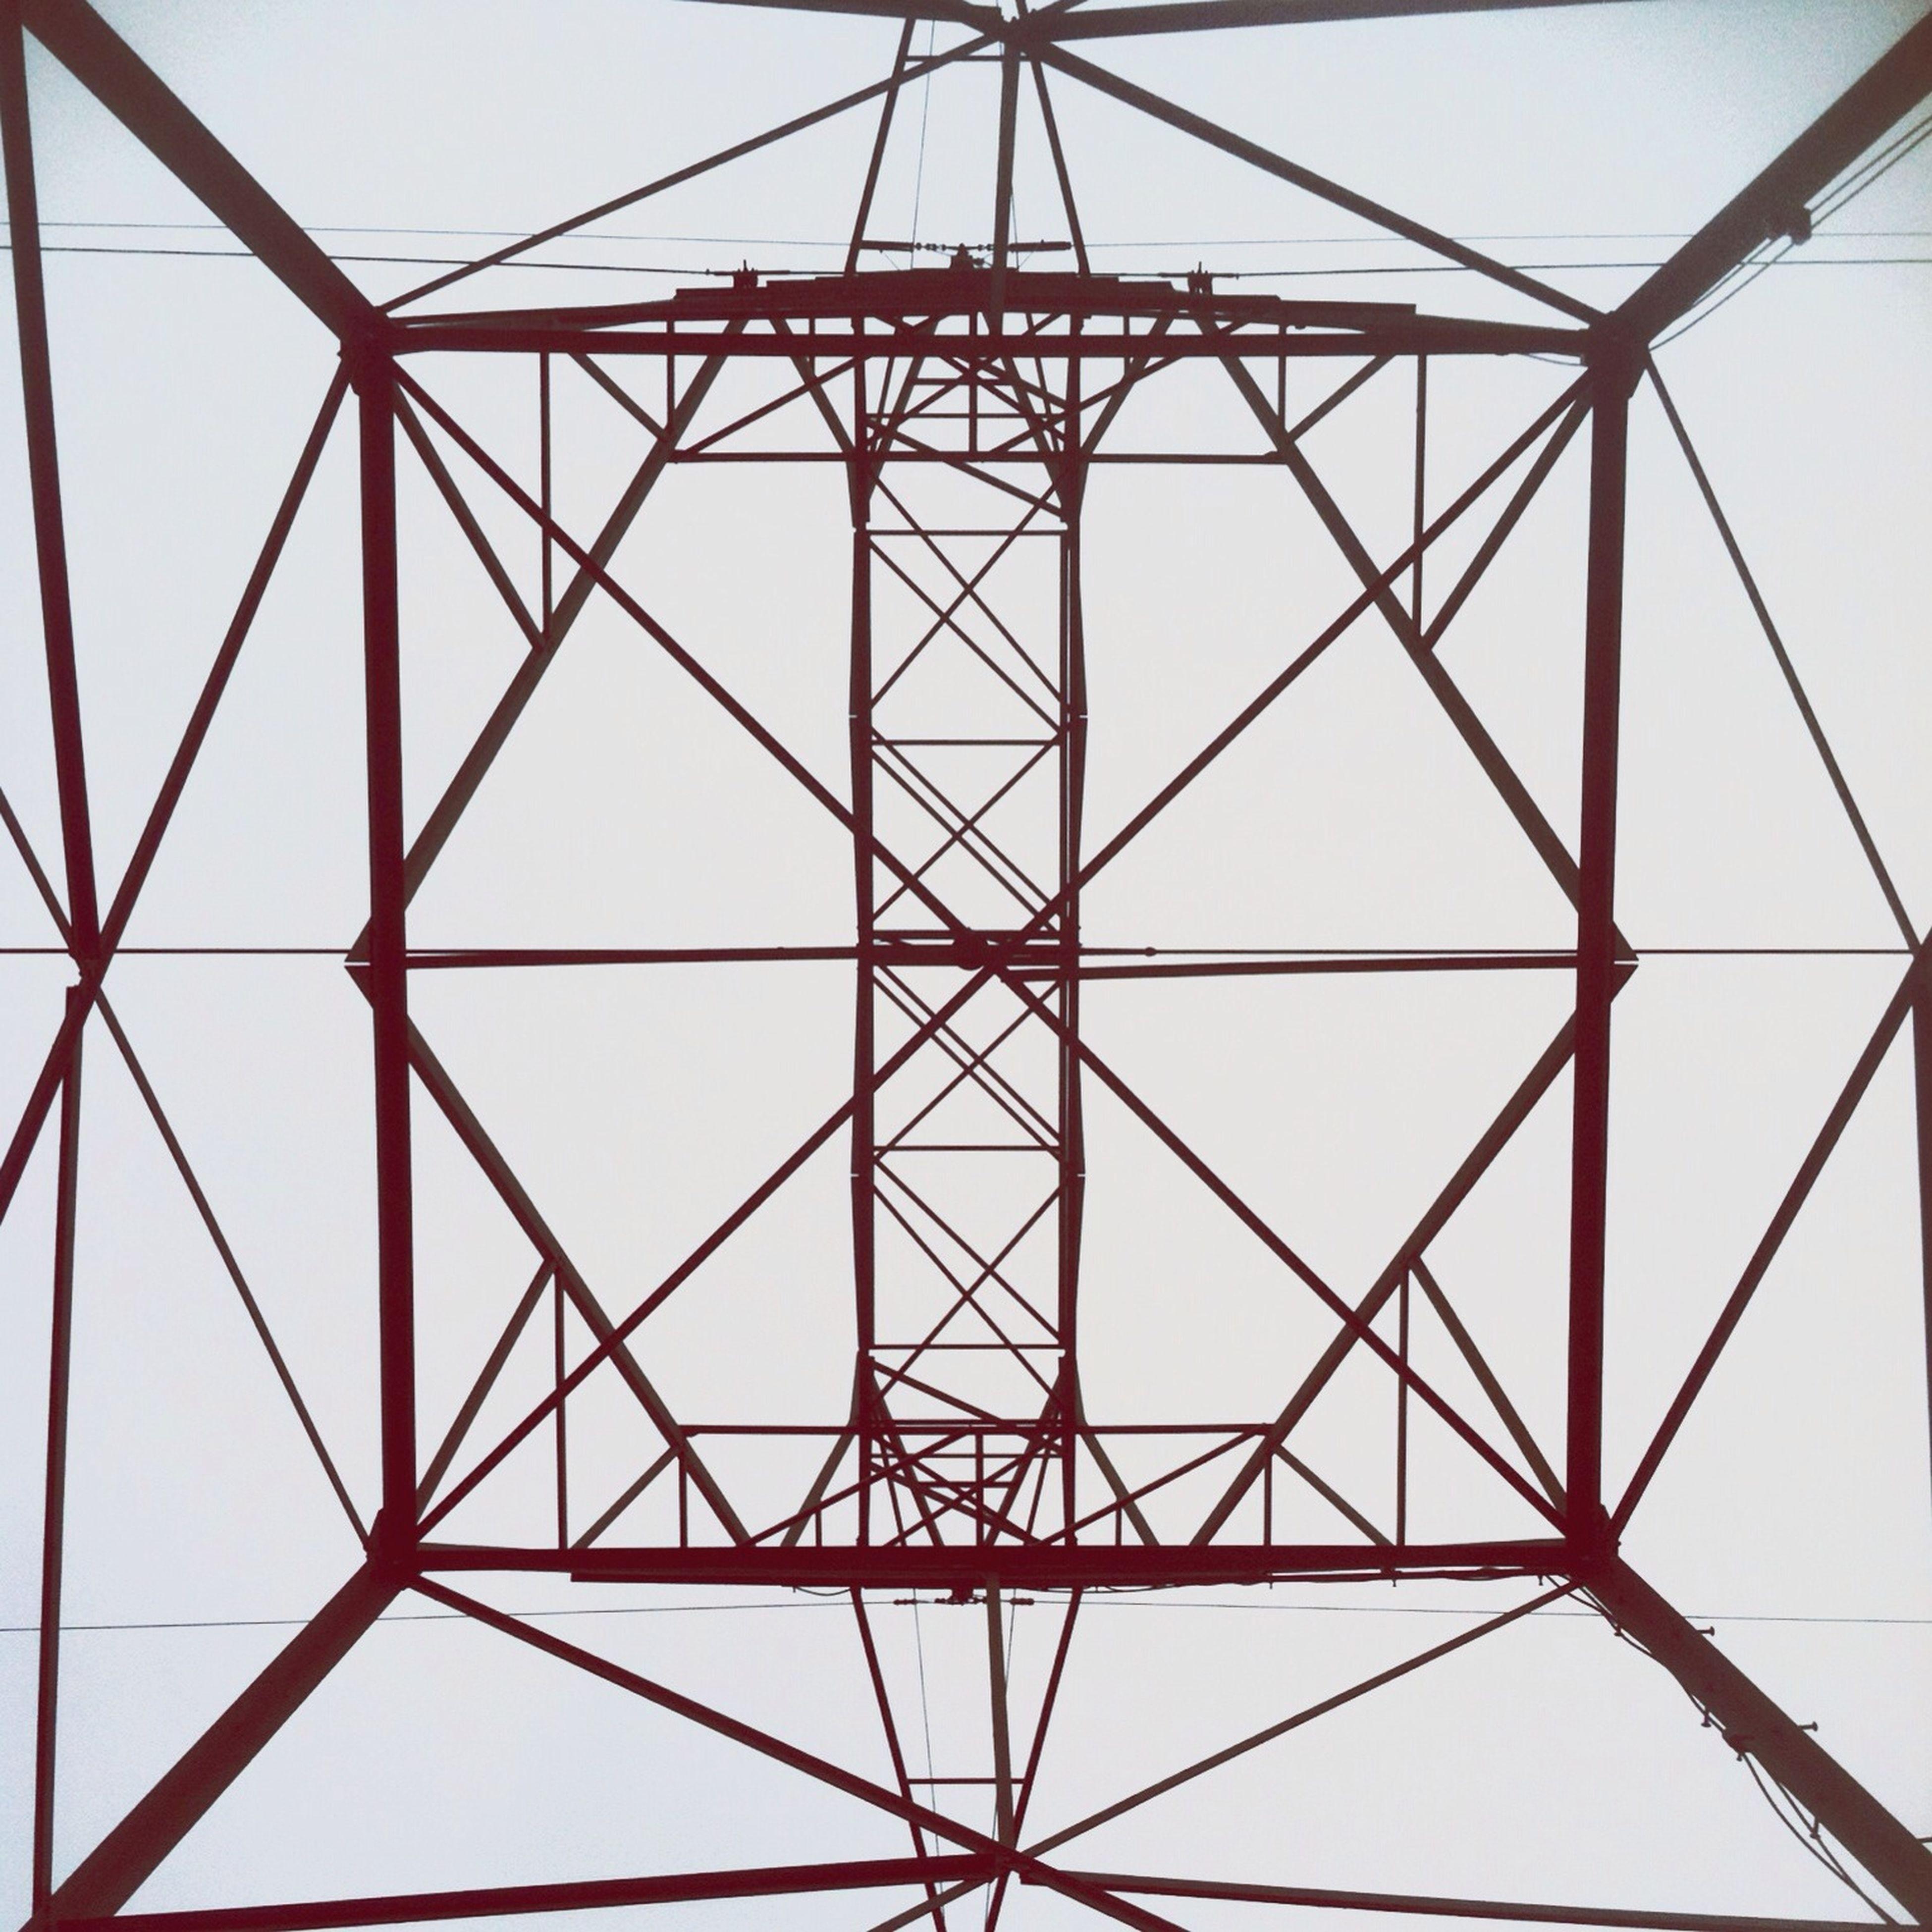 Directly Below Shot Of Metallic Tower Against Sky